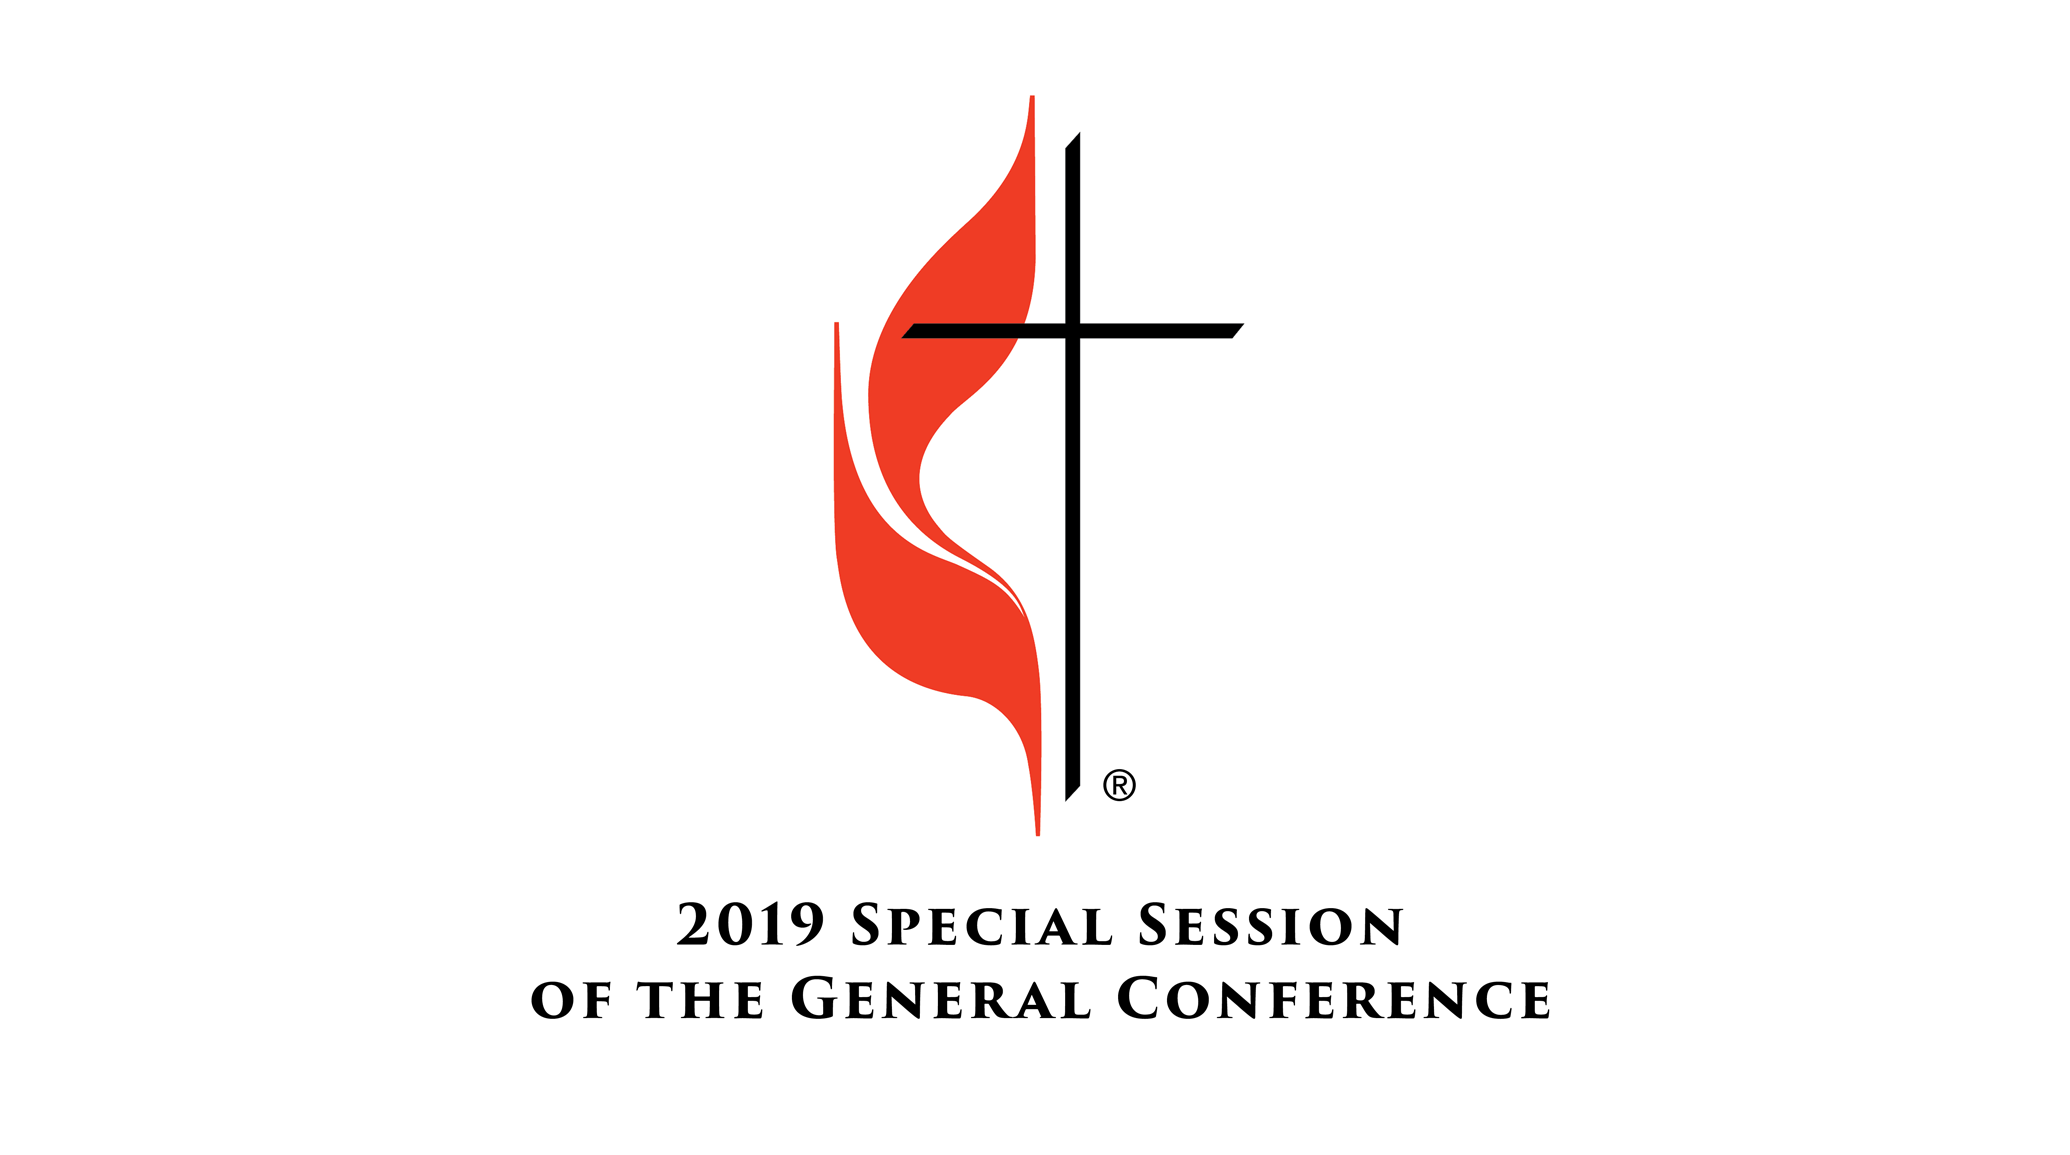 2019-General-Conference-Logo-2070.png